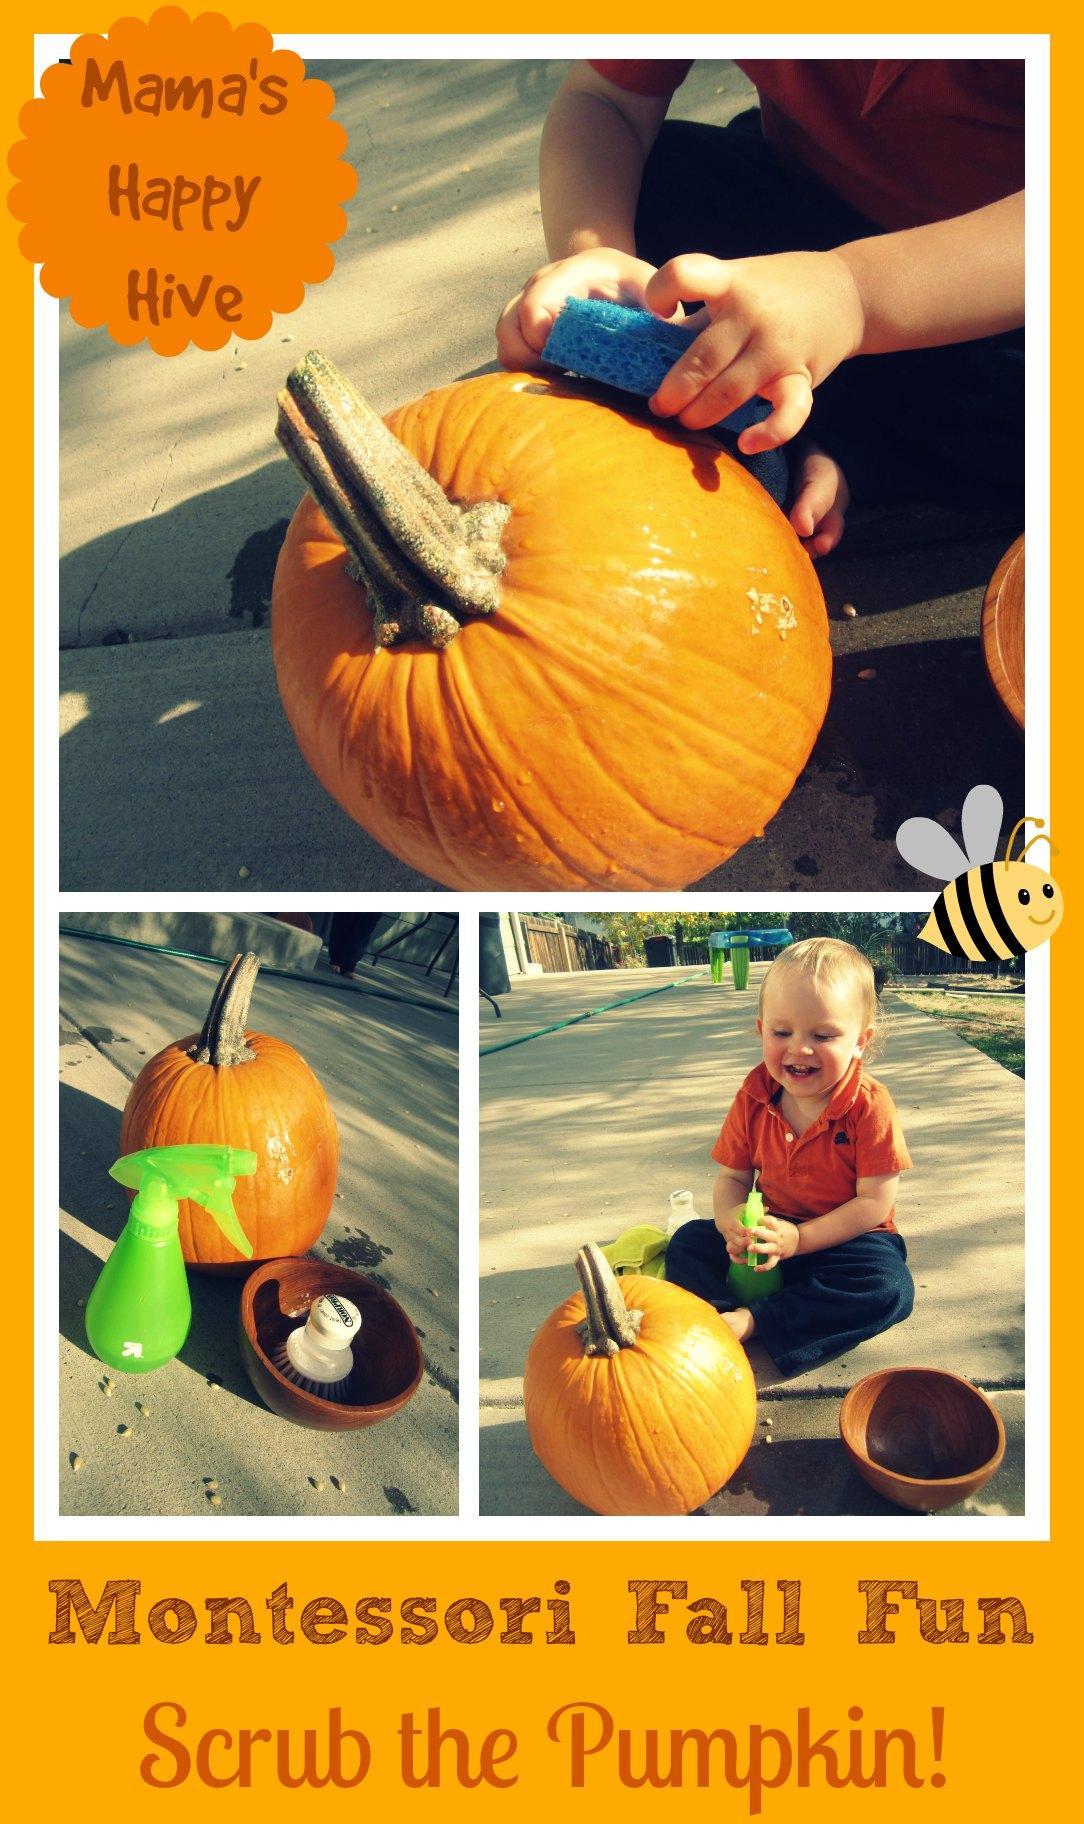 Montessori Fall Fun – Scrub the Pumpkin